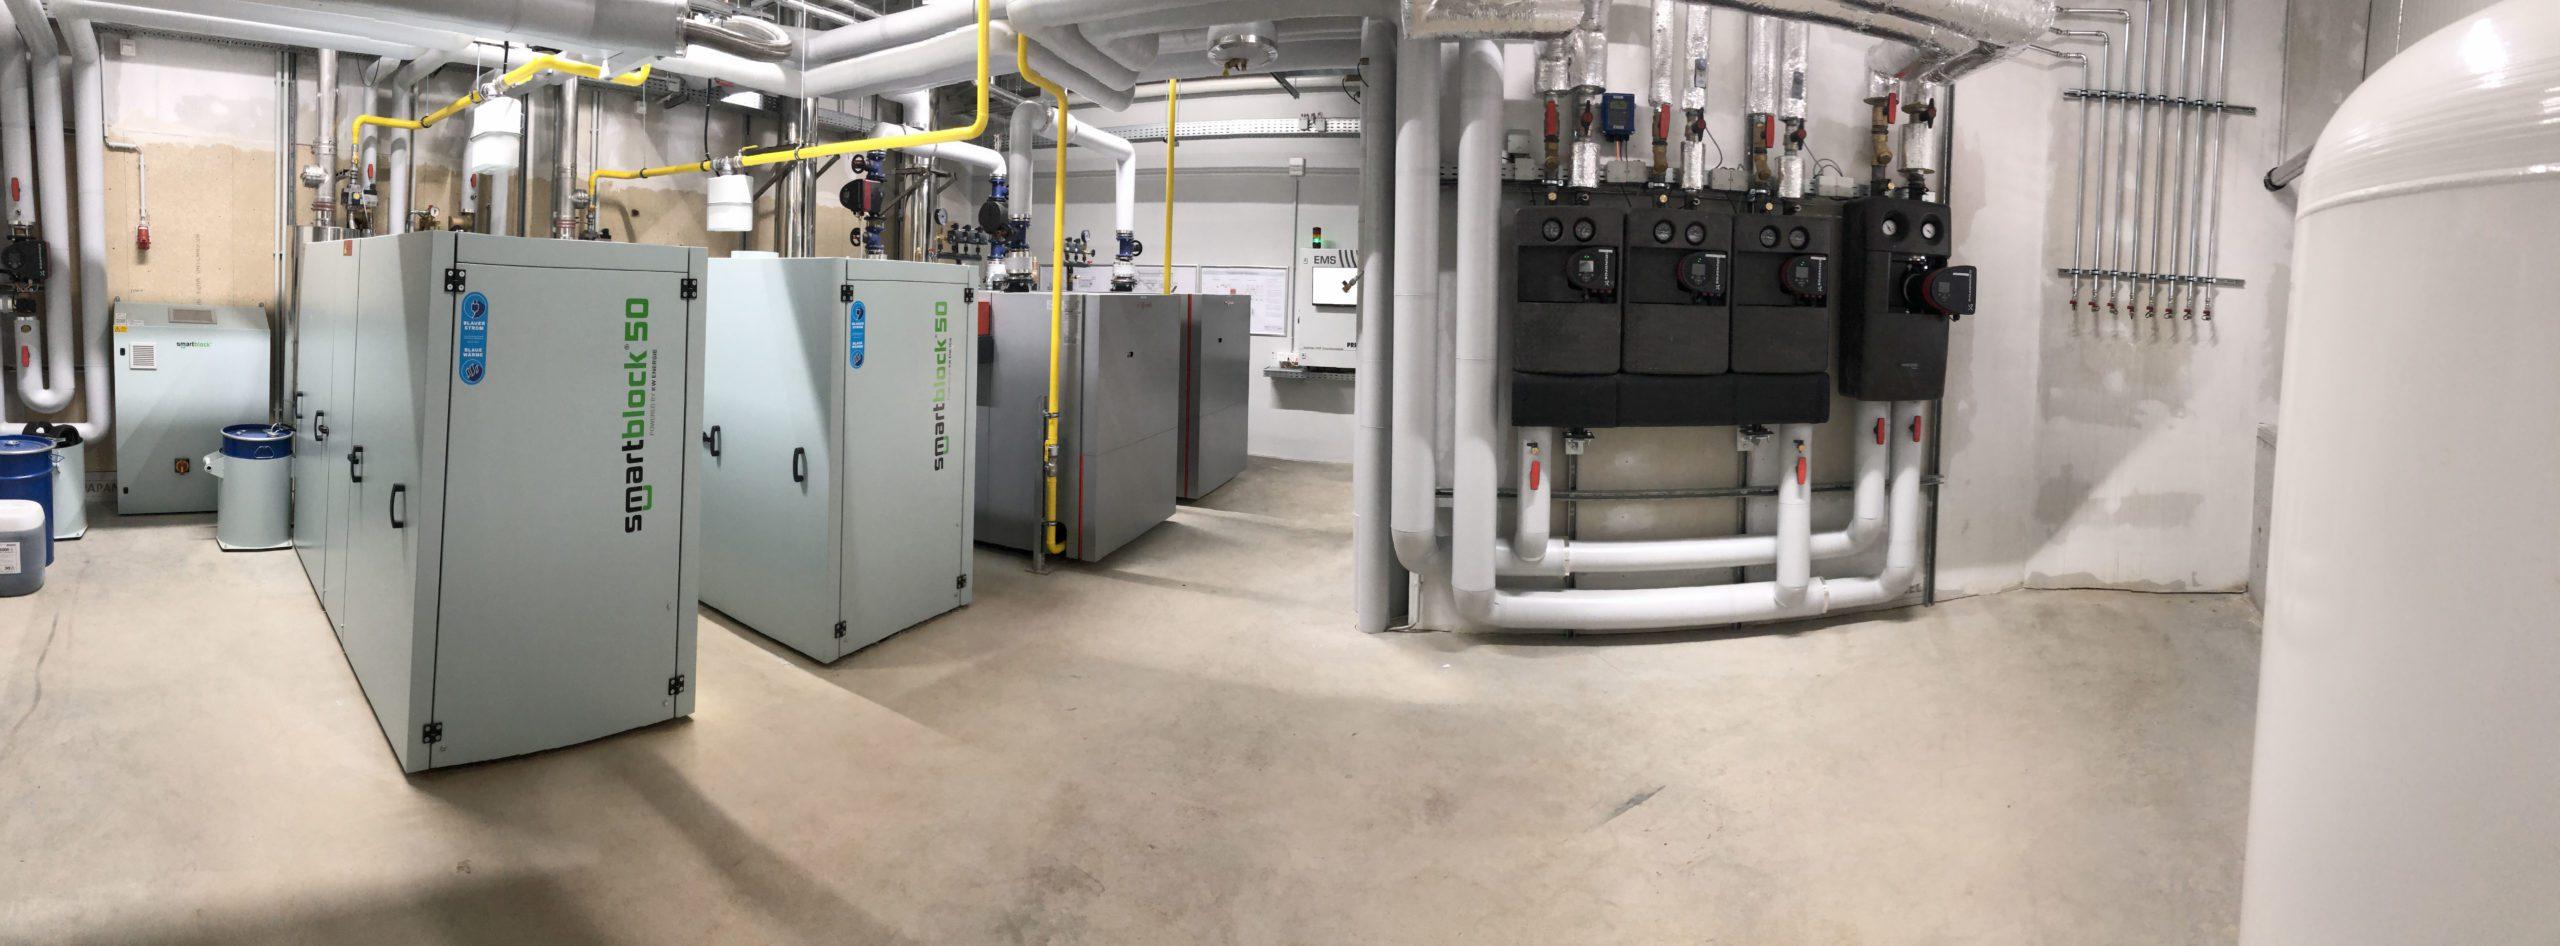 SEHON BHKW Technik mit Energie Management System